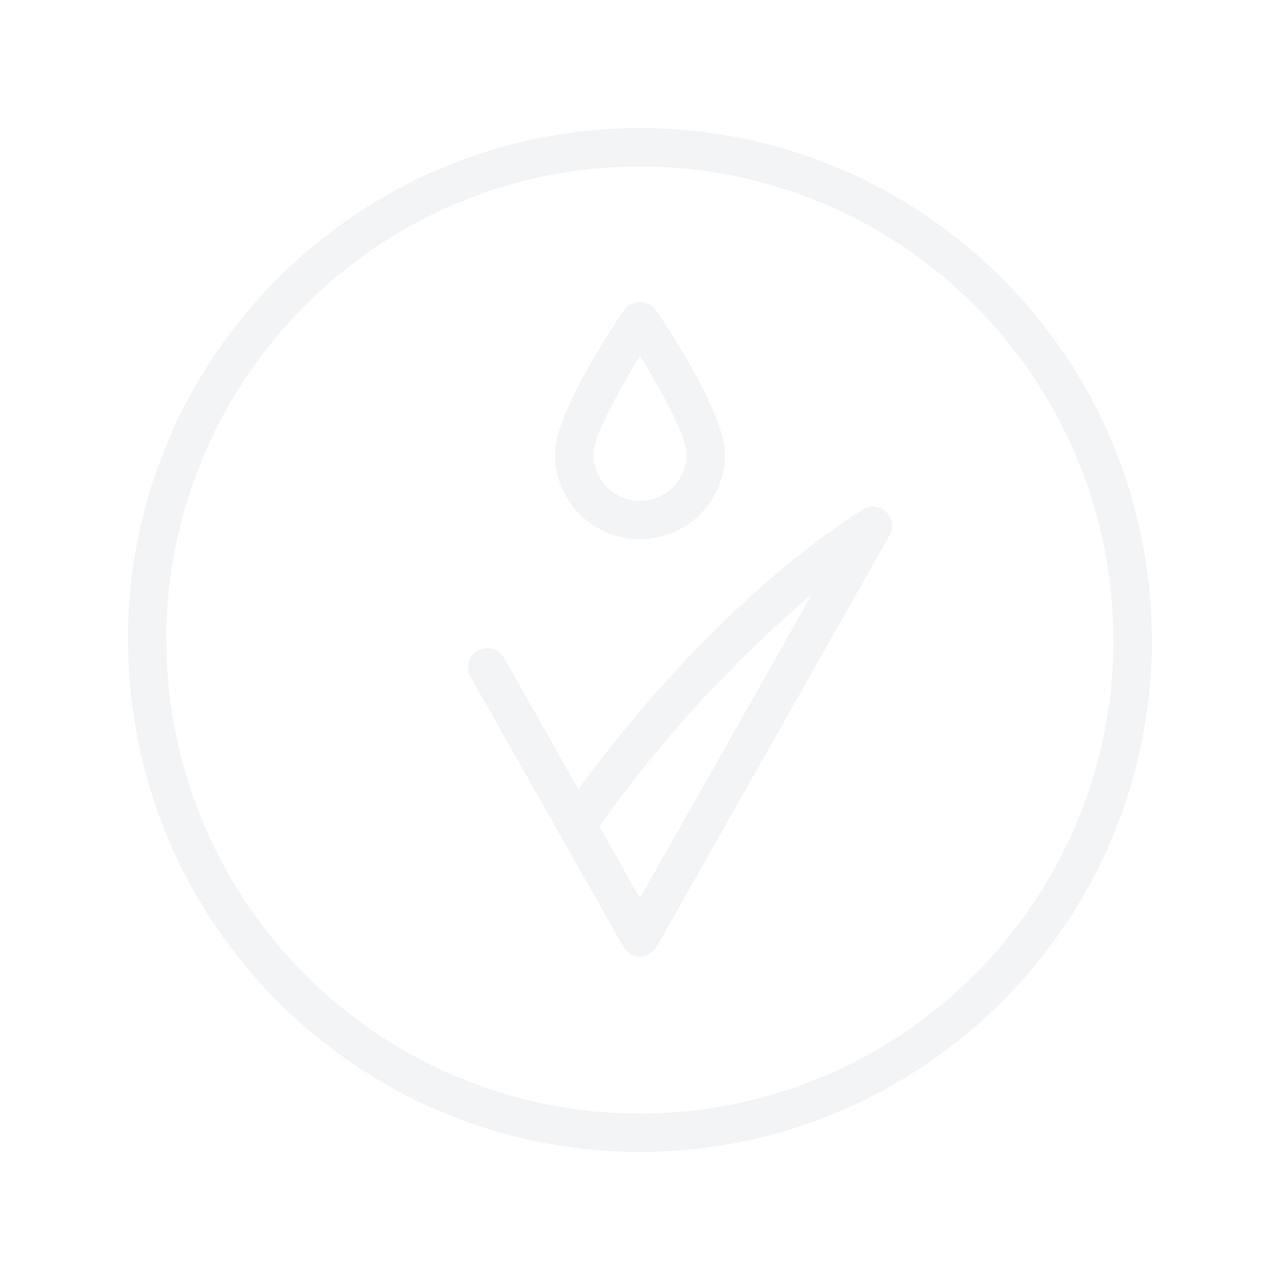 TAHE Botanic Keratin Gold Satin 5 Hairspray 400ml